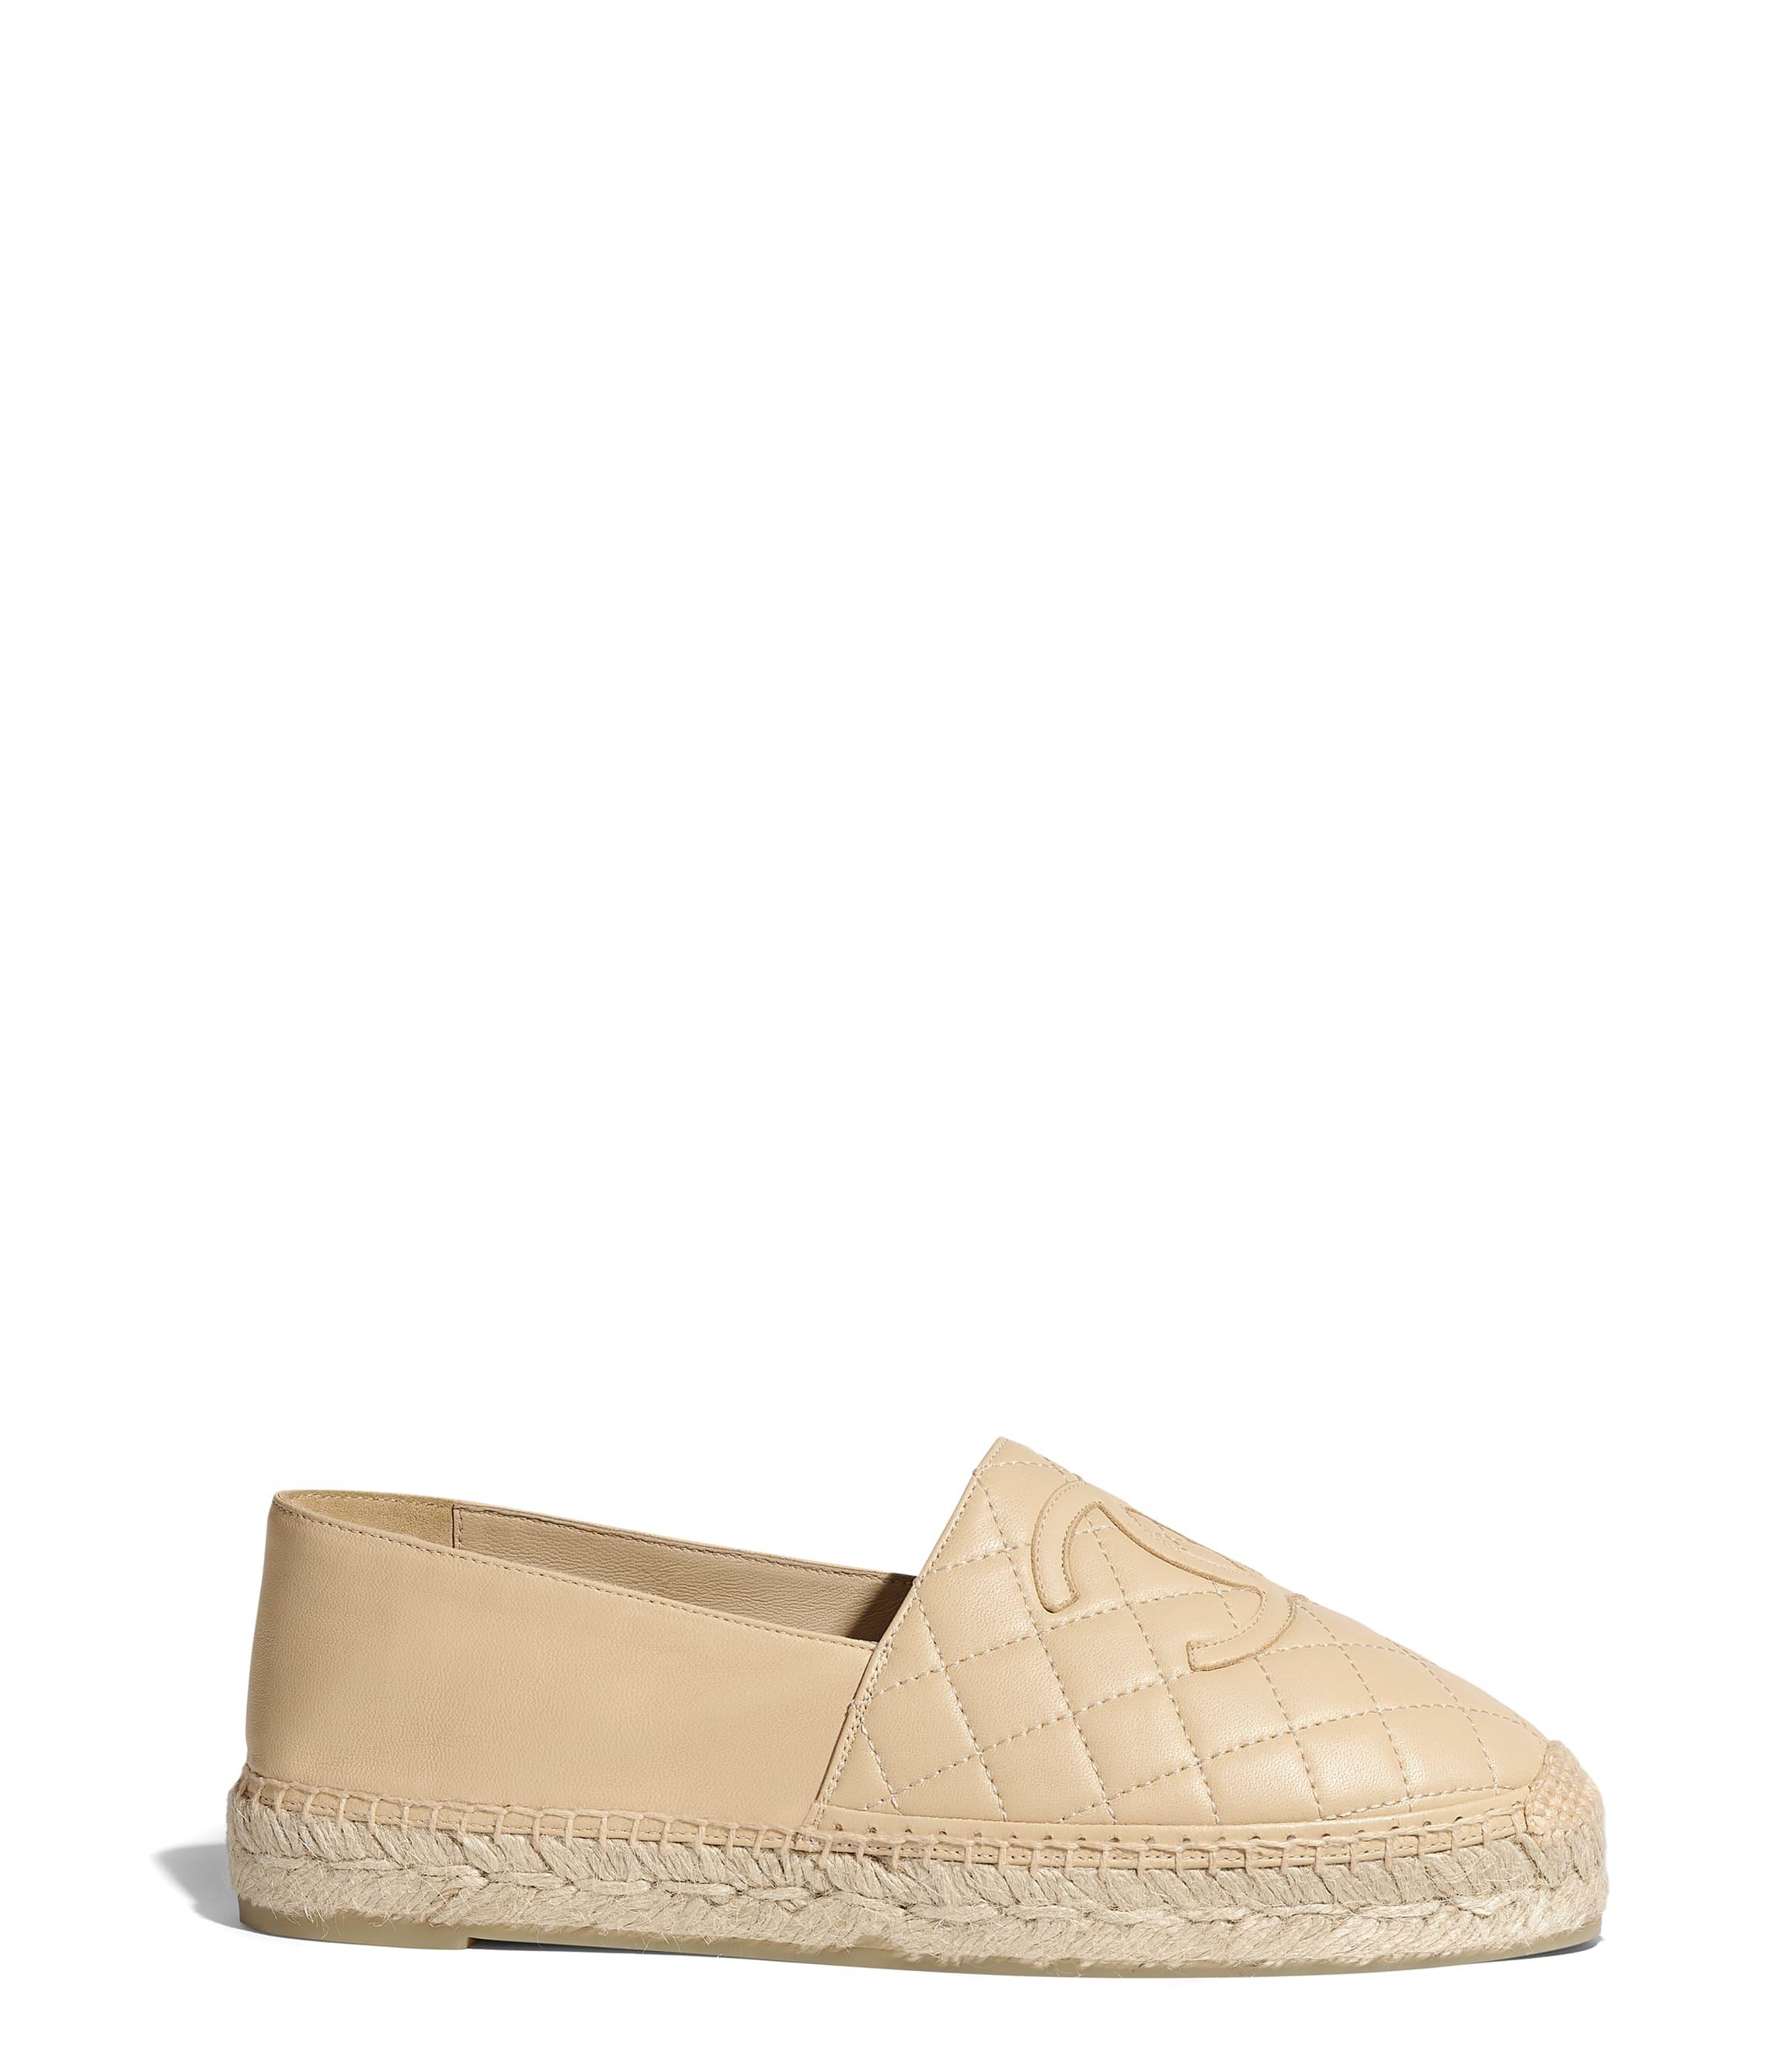 89ddd3de34f Espadrilles - Chaussures - CHANEL